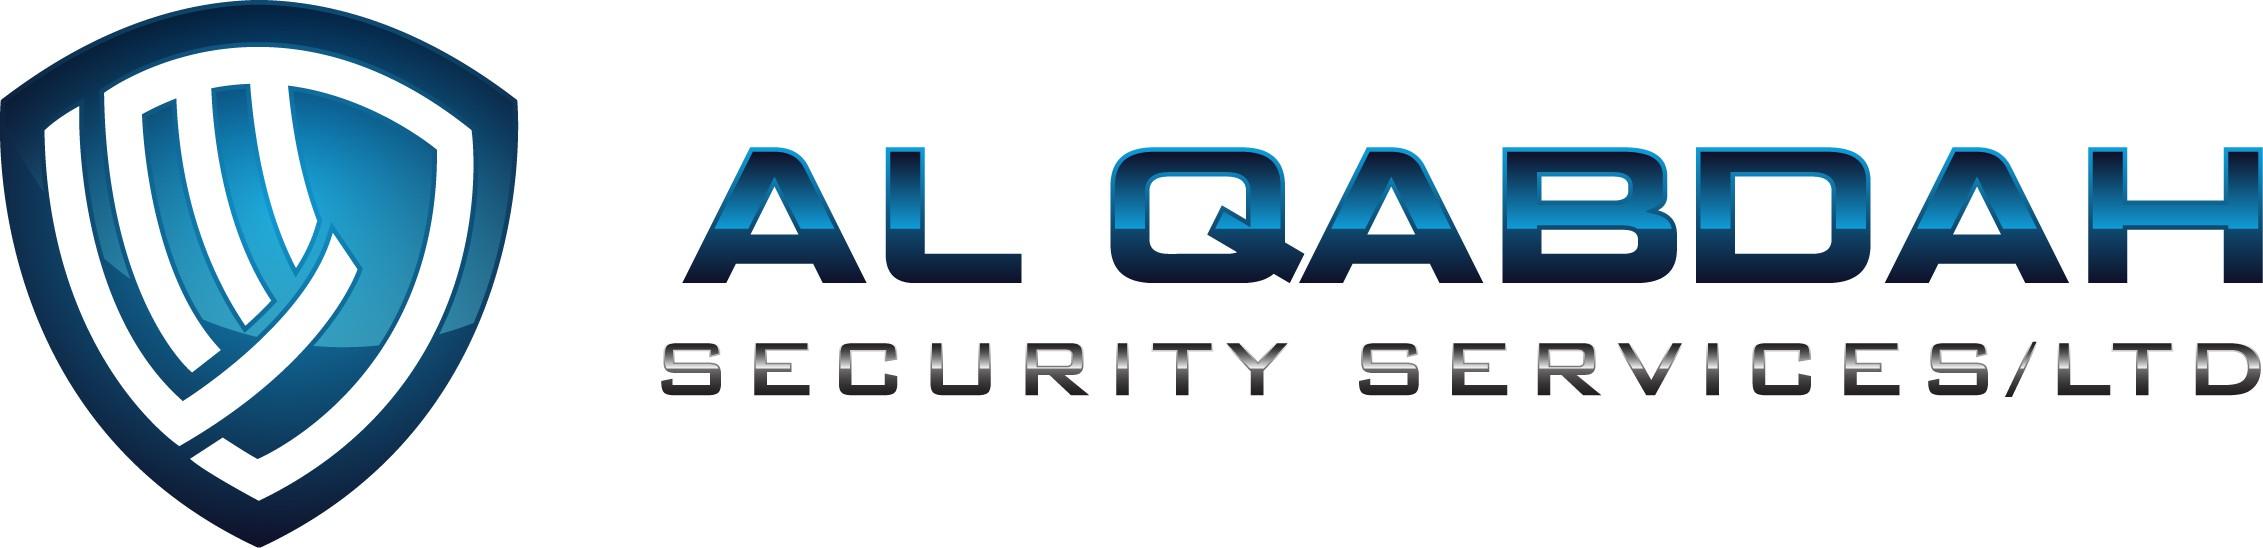 Al Qabdah Security company needs  new Logo & Business card